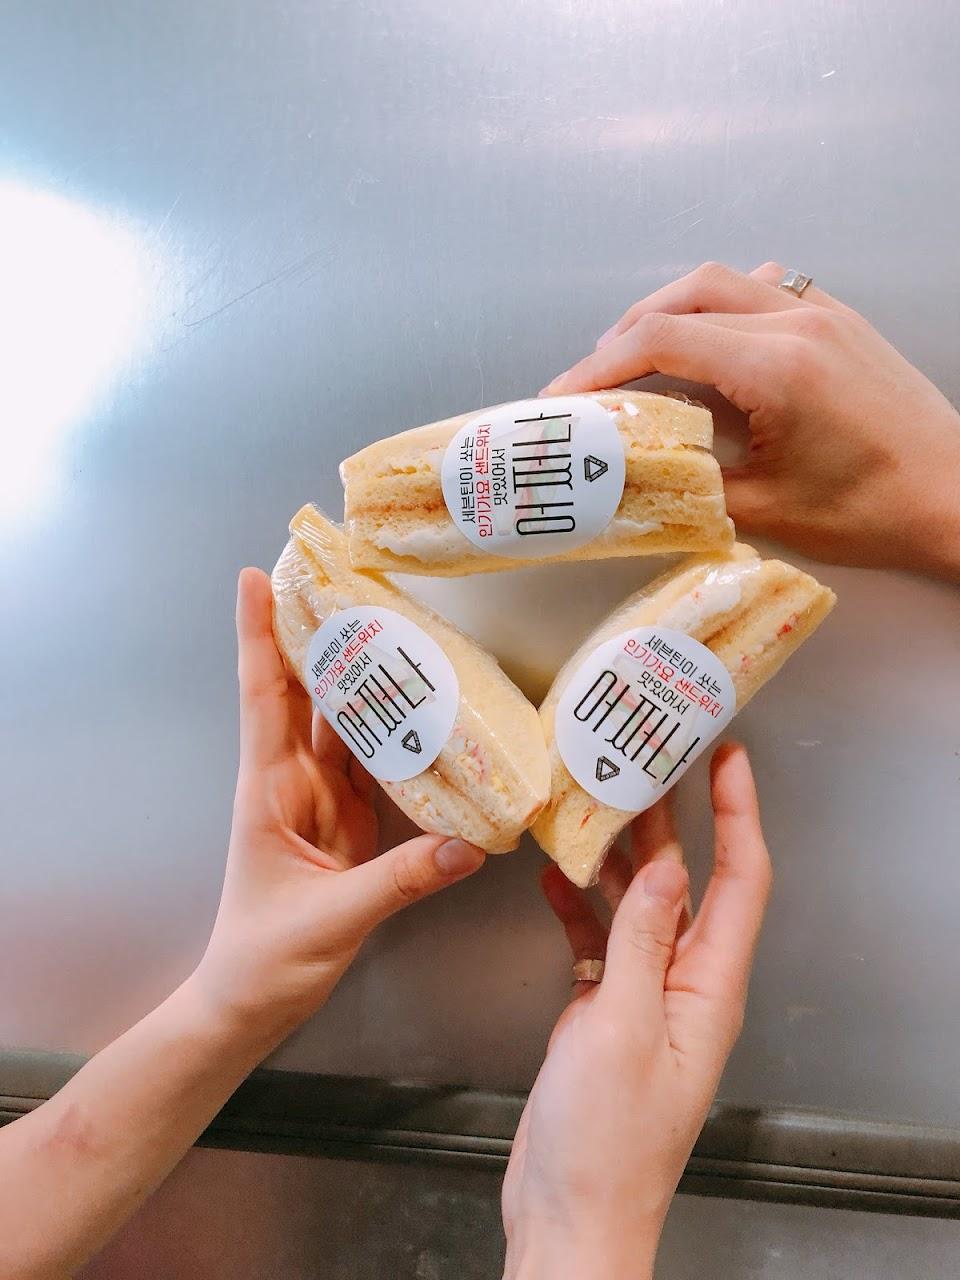 seventeen inkigayo sandwich @pledis_17 hoshi joshua seungkwan 3